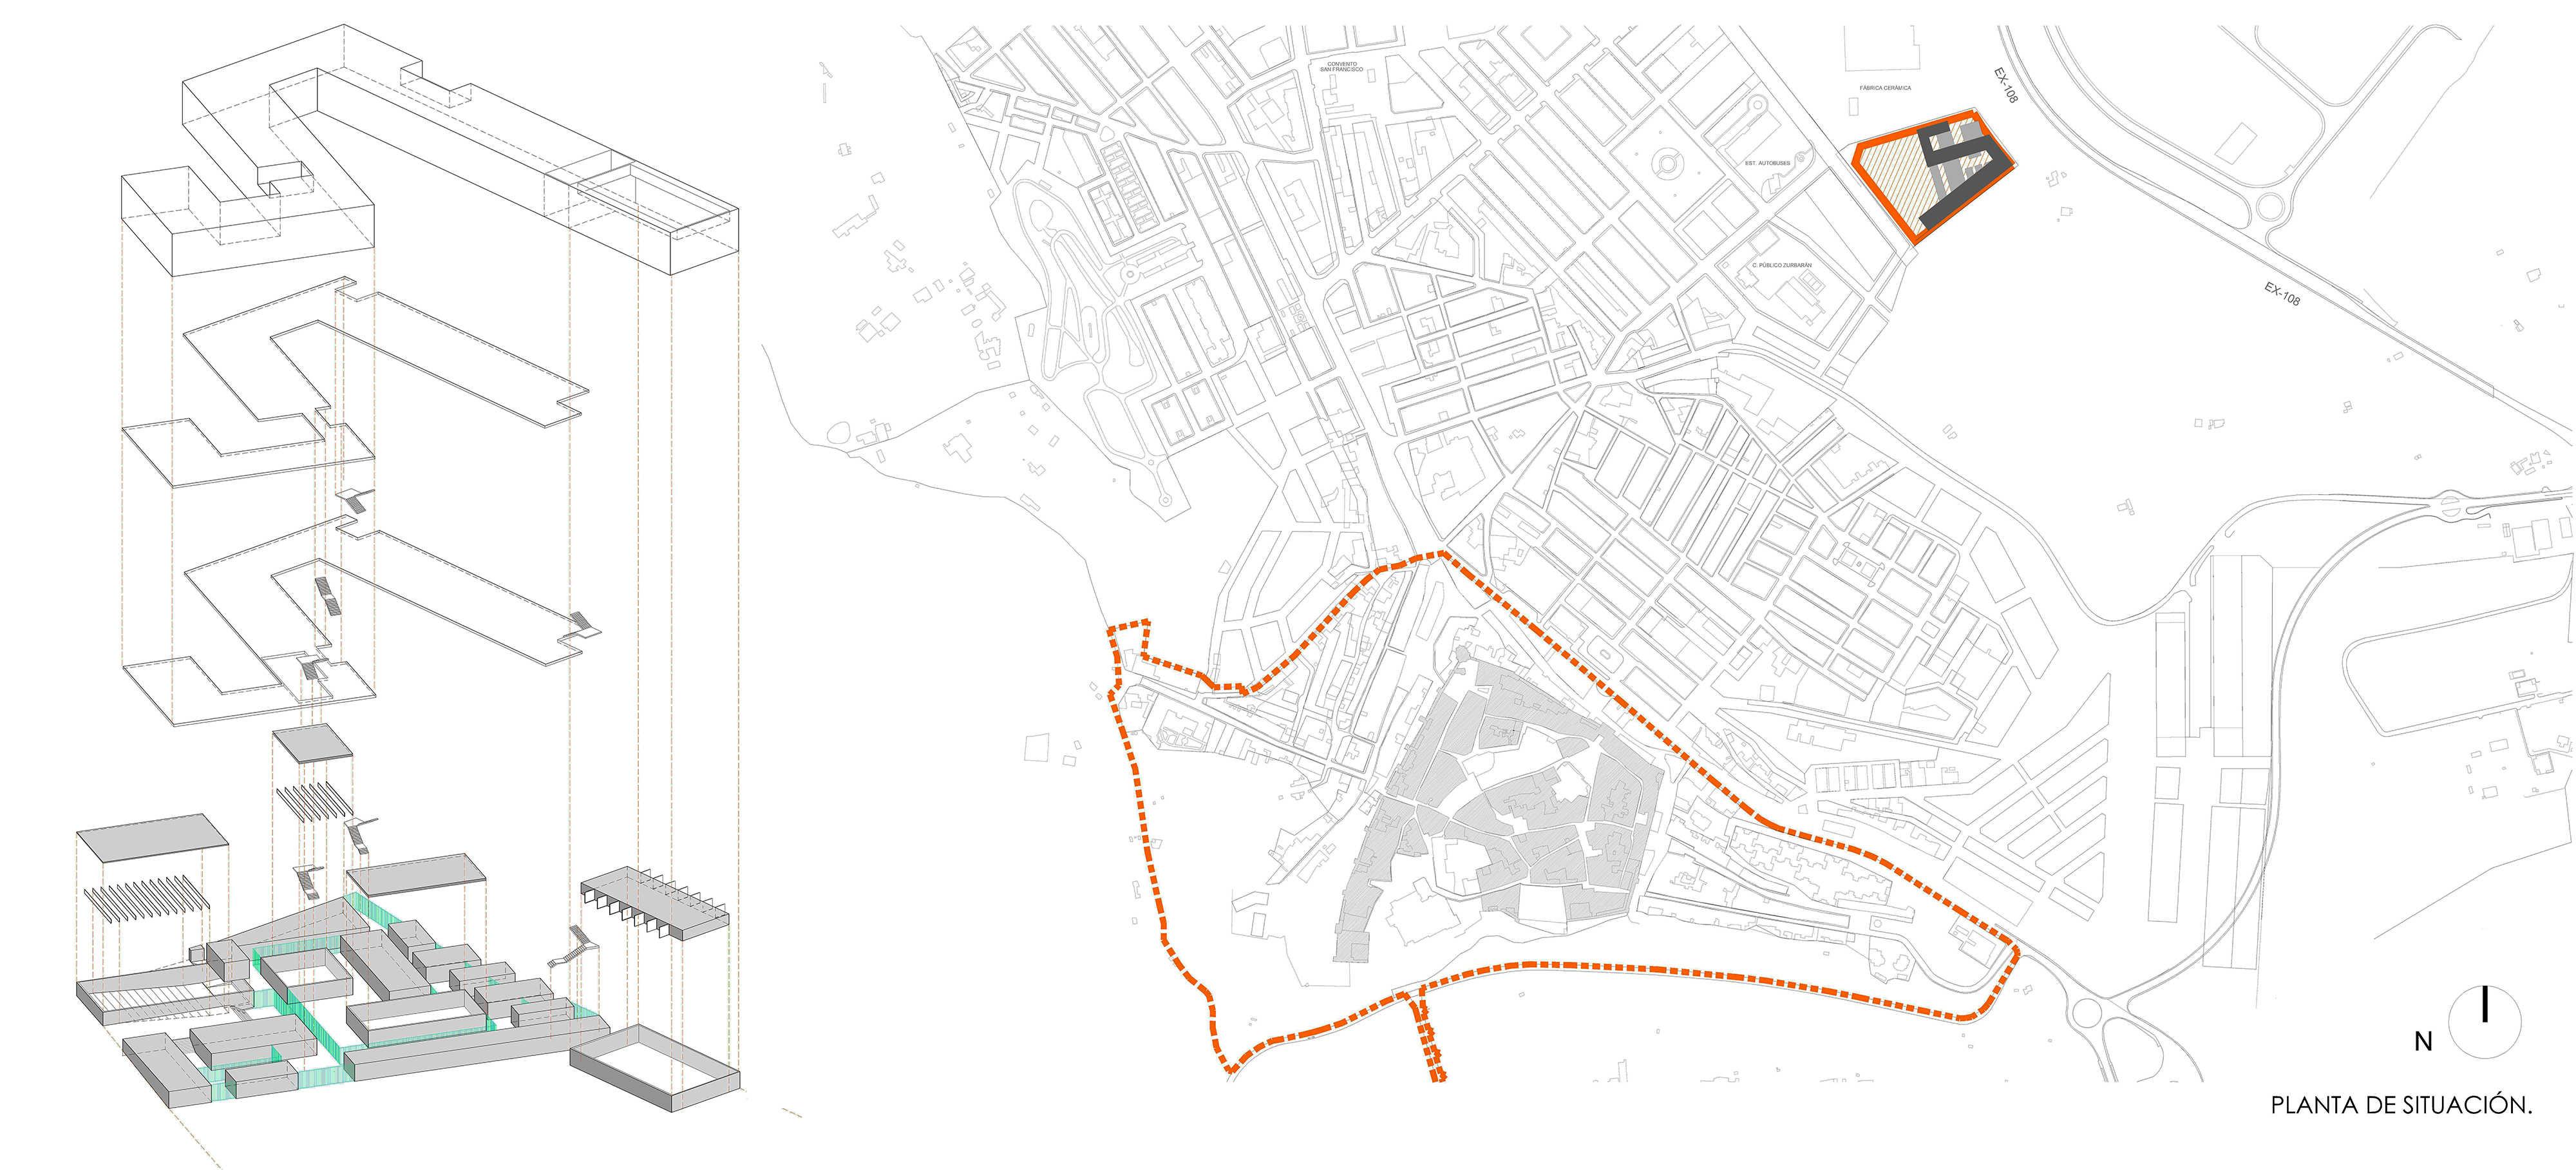 LOCATION PLAN LANDINEZ+REY arquitectos [eL2Gaa]